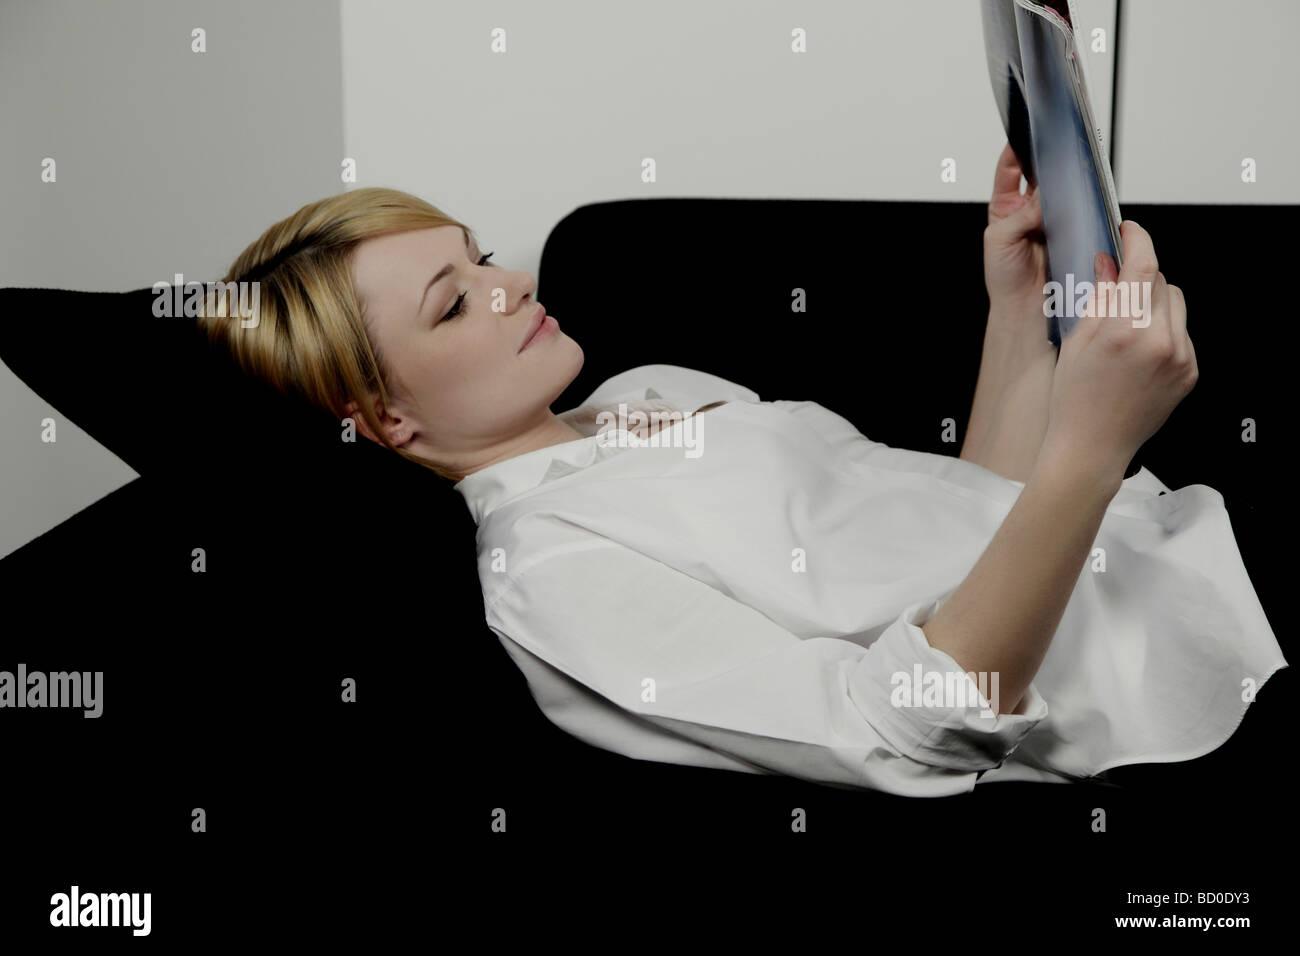 Woman laying on sofa reading magazine. - Stock Image